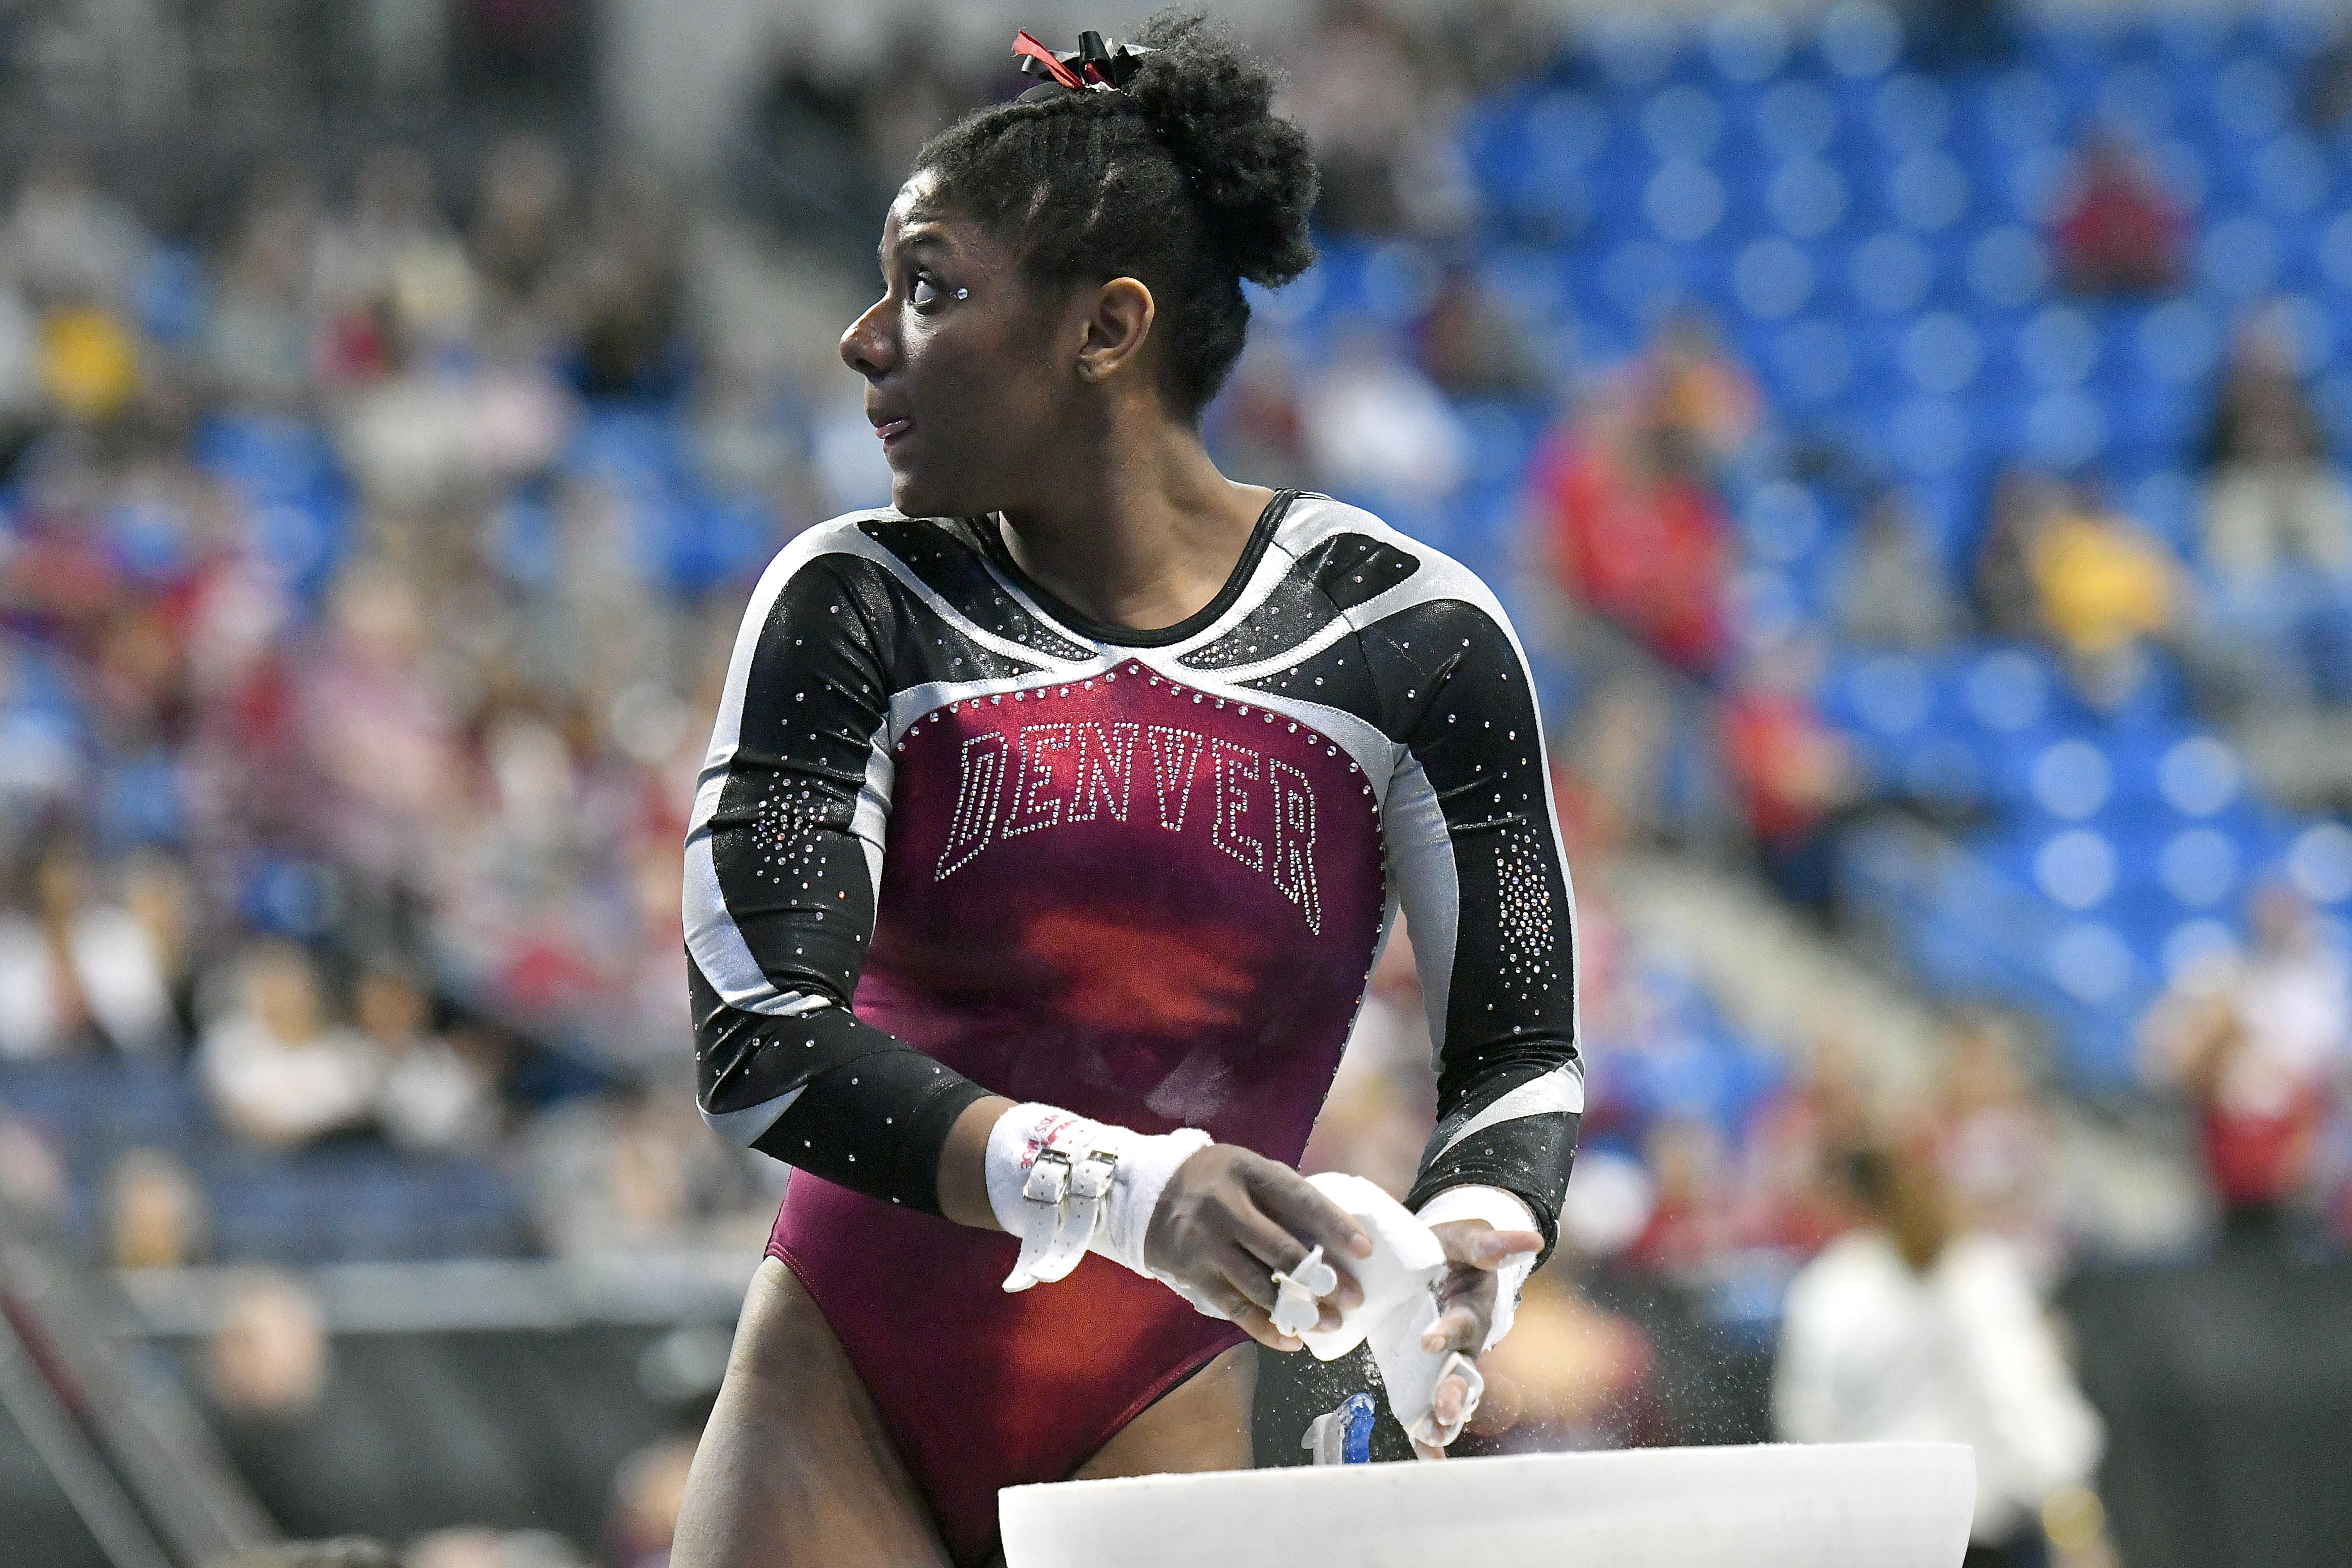 NCAA GYMNASTICS: APR 20 Women's National Championship